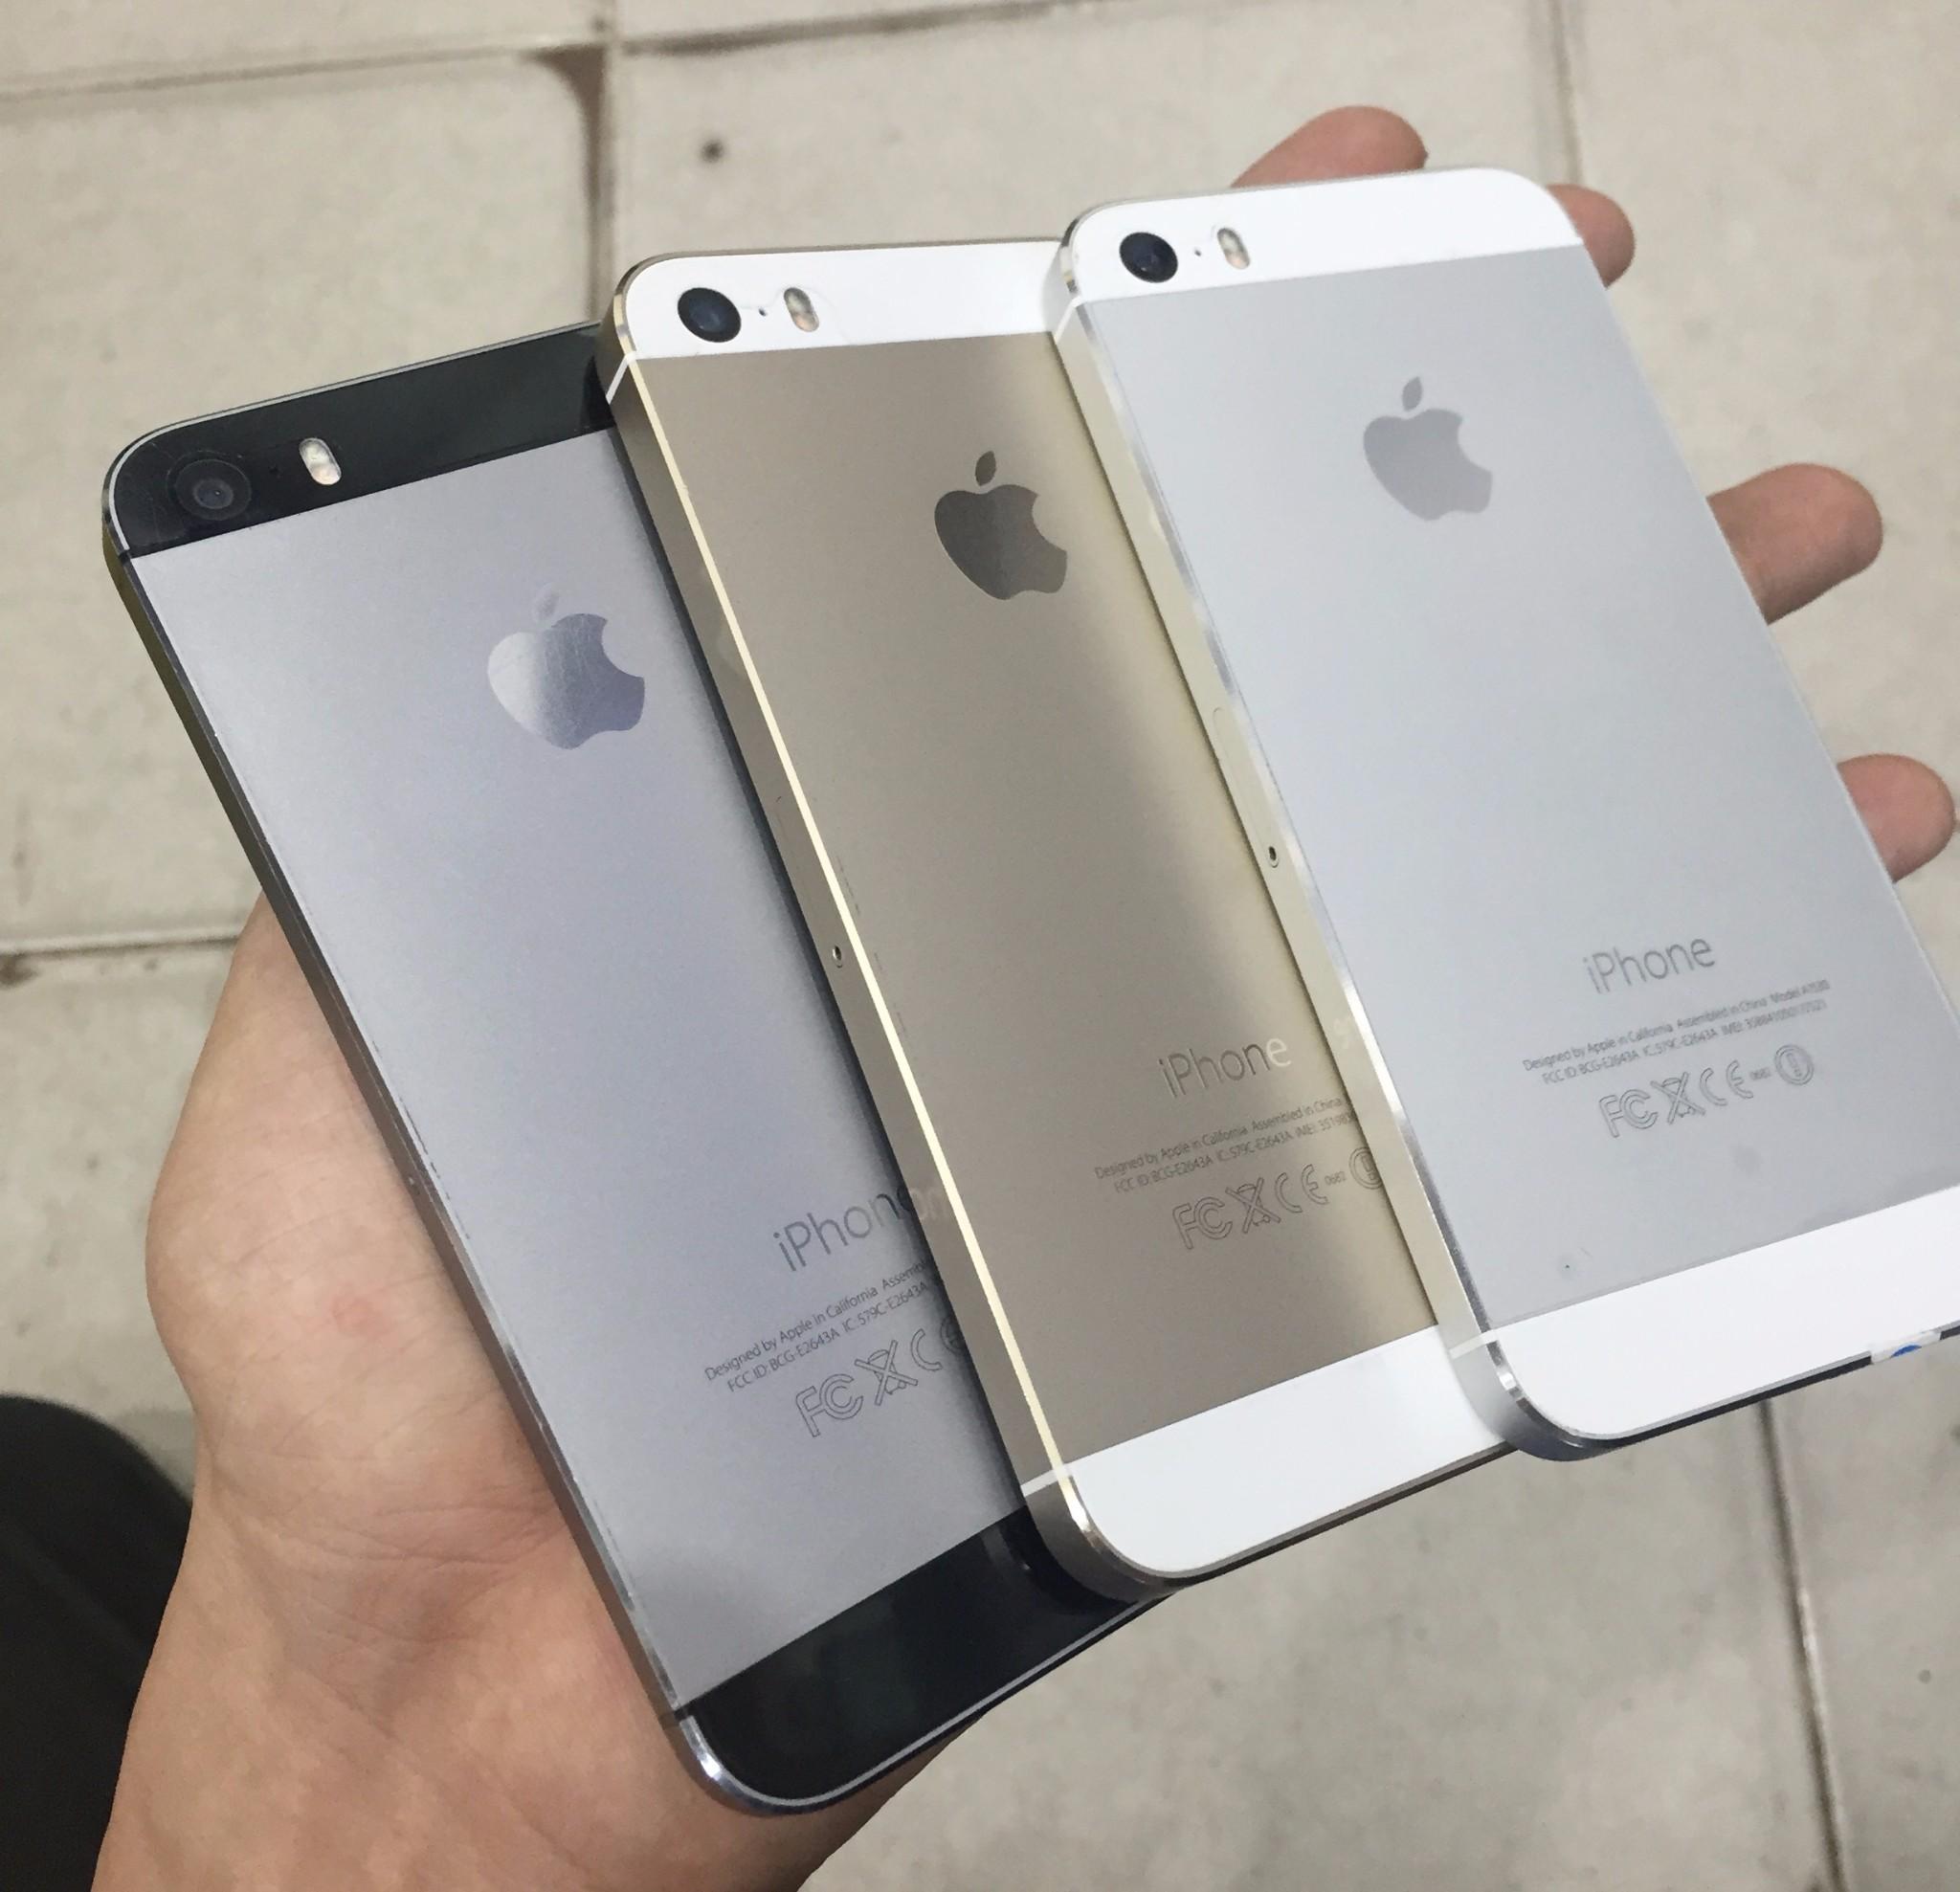 Jual Iphone 5s 16gb Mulus 99 Ori Fullset Gold Grey Silver Se 16 Gb Gfbstore Tokopedia